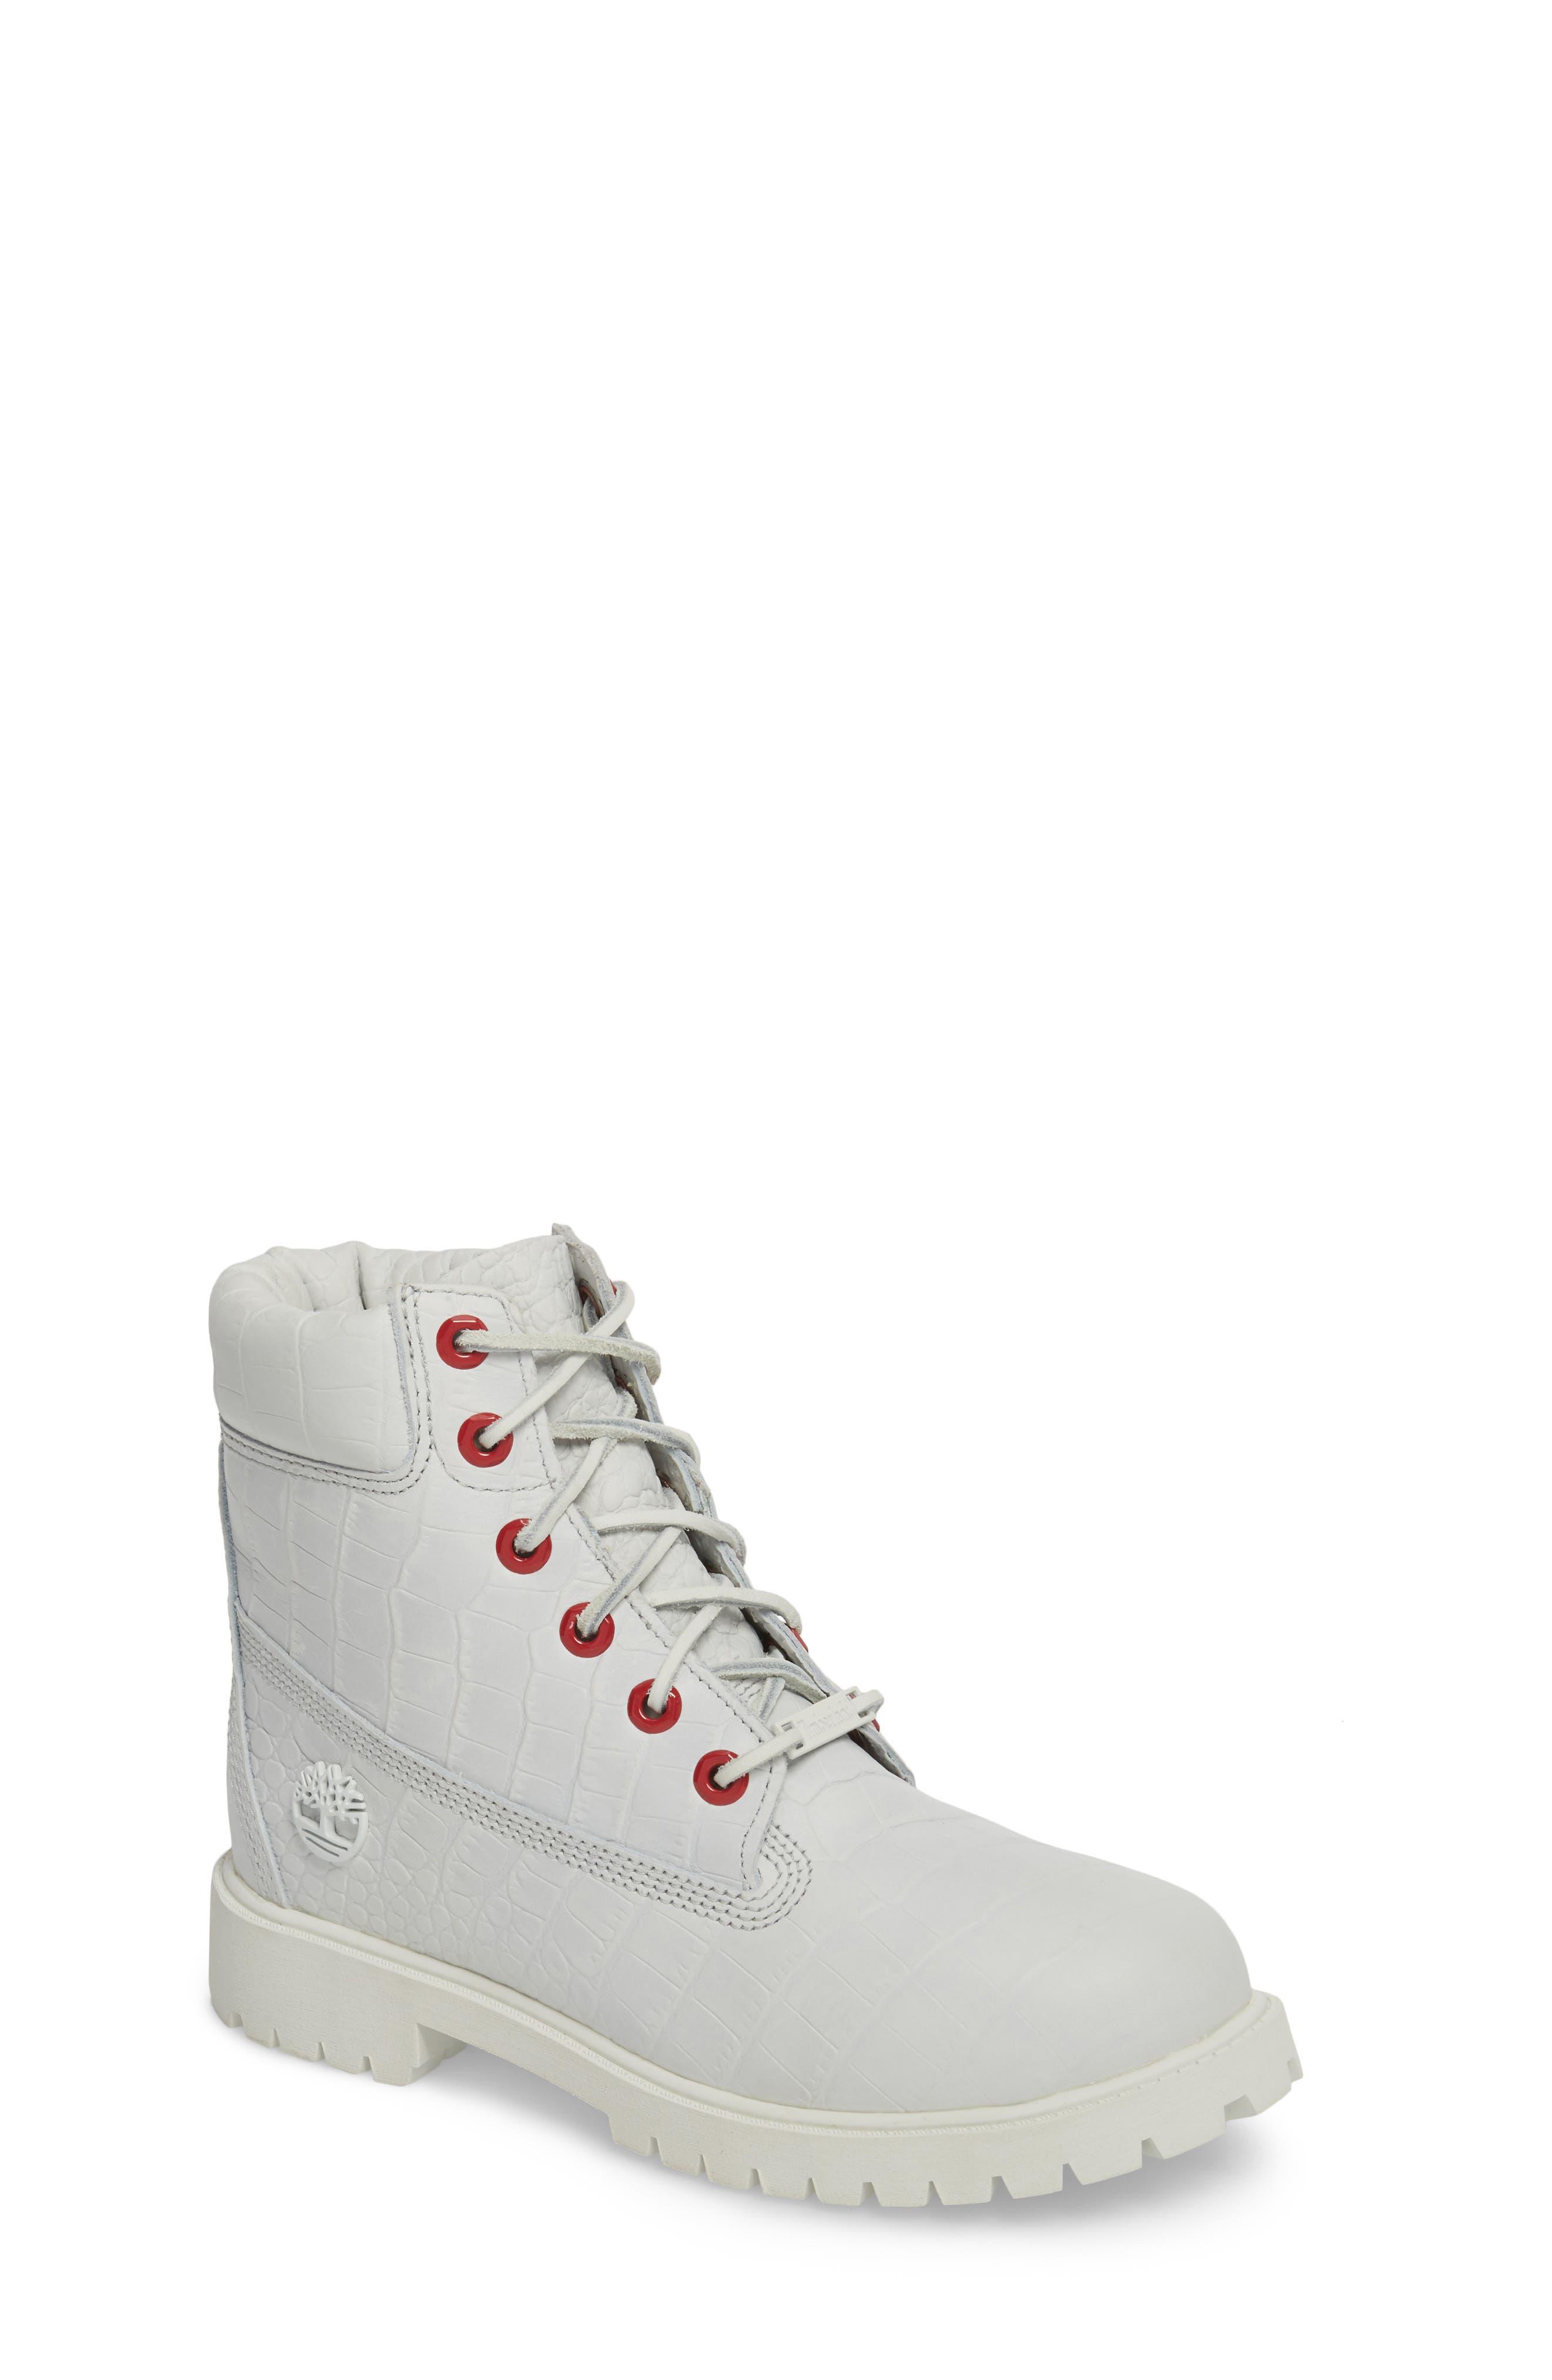 6-Inch Premium Waterproof Boot,                         Main,                         color, White Cardinal Exotic